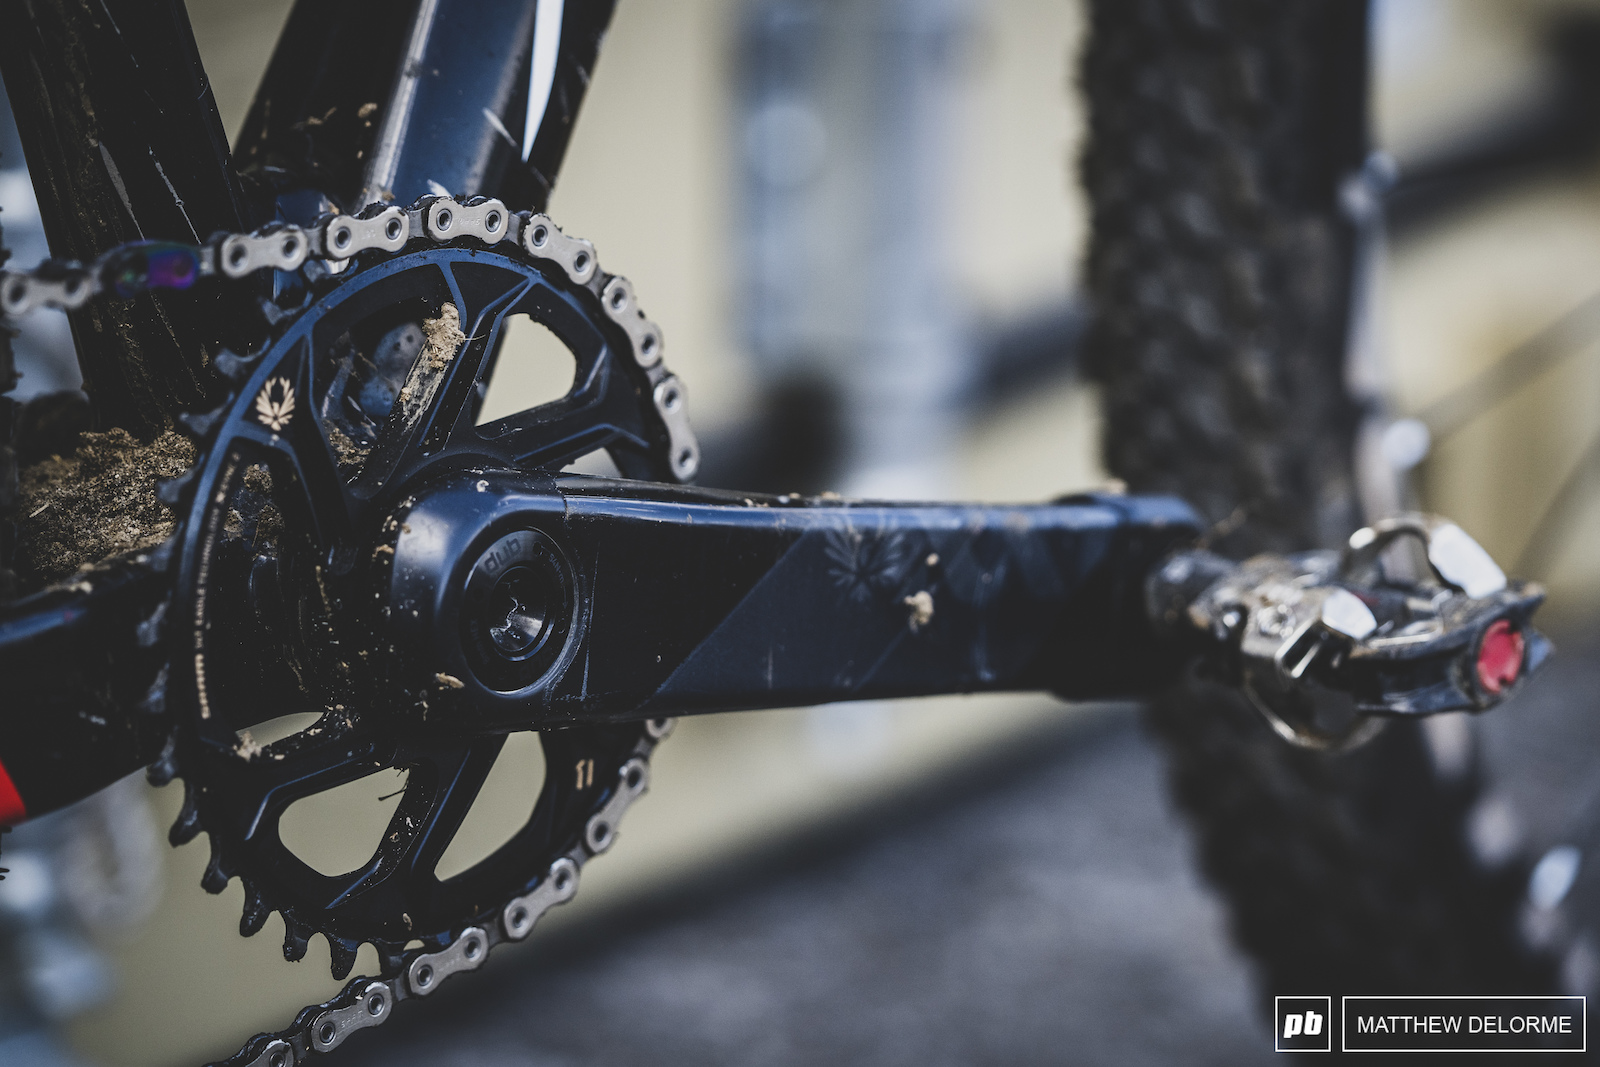 Eagle XX1 cranks keep the bike in motion.